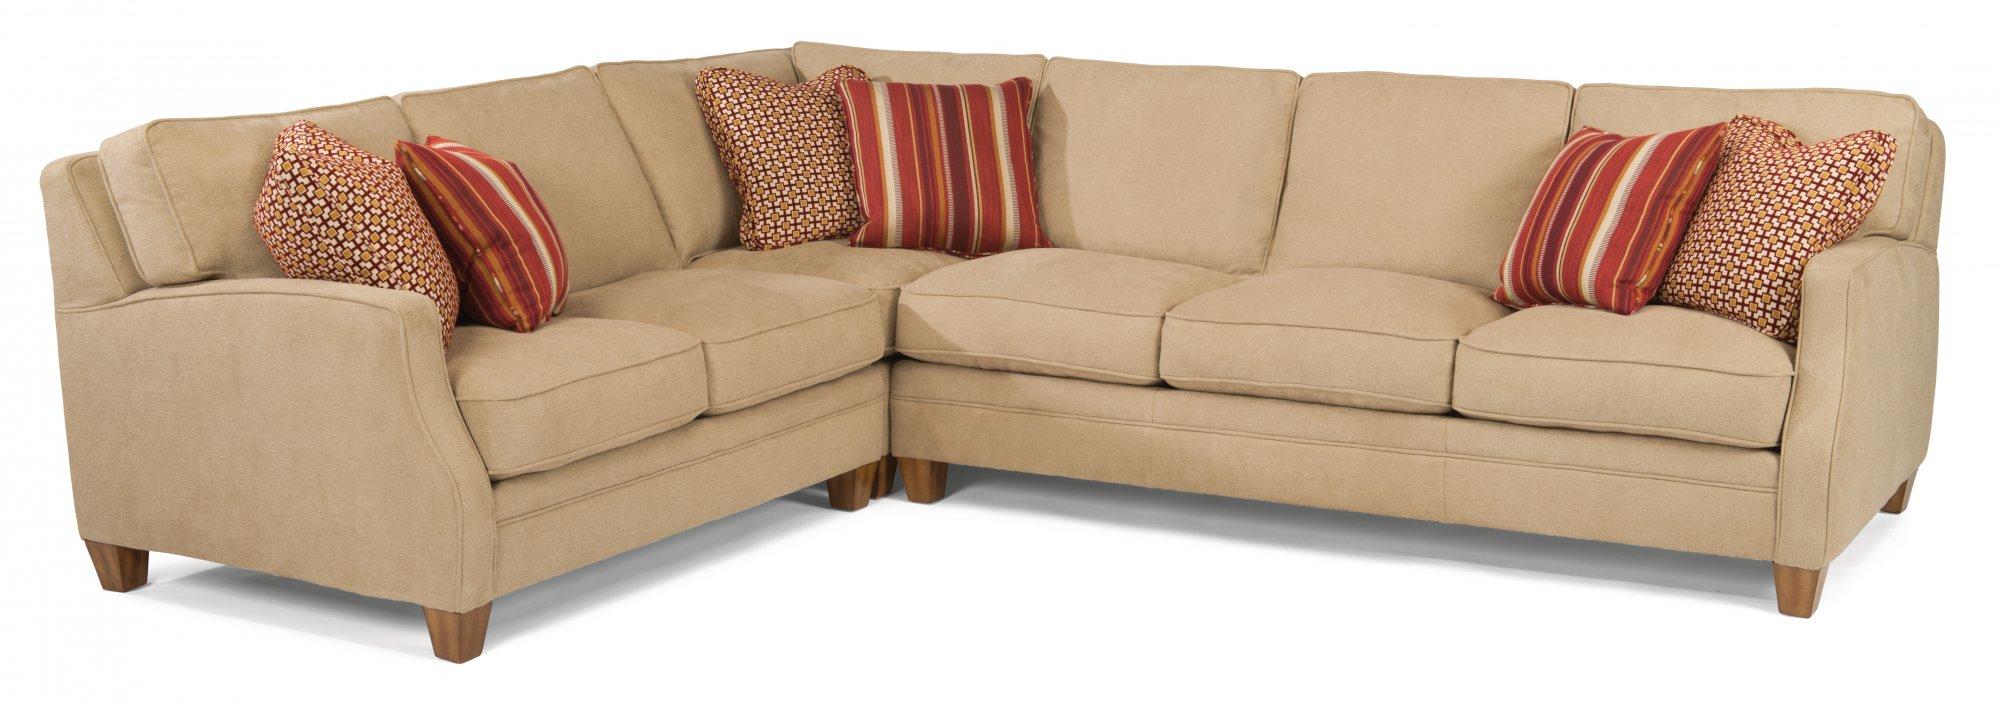 Model: 7564-Sect | Flexsteel Lennox  Fabric Sectional